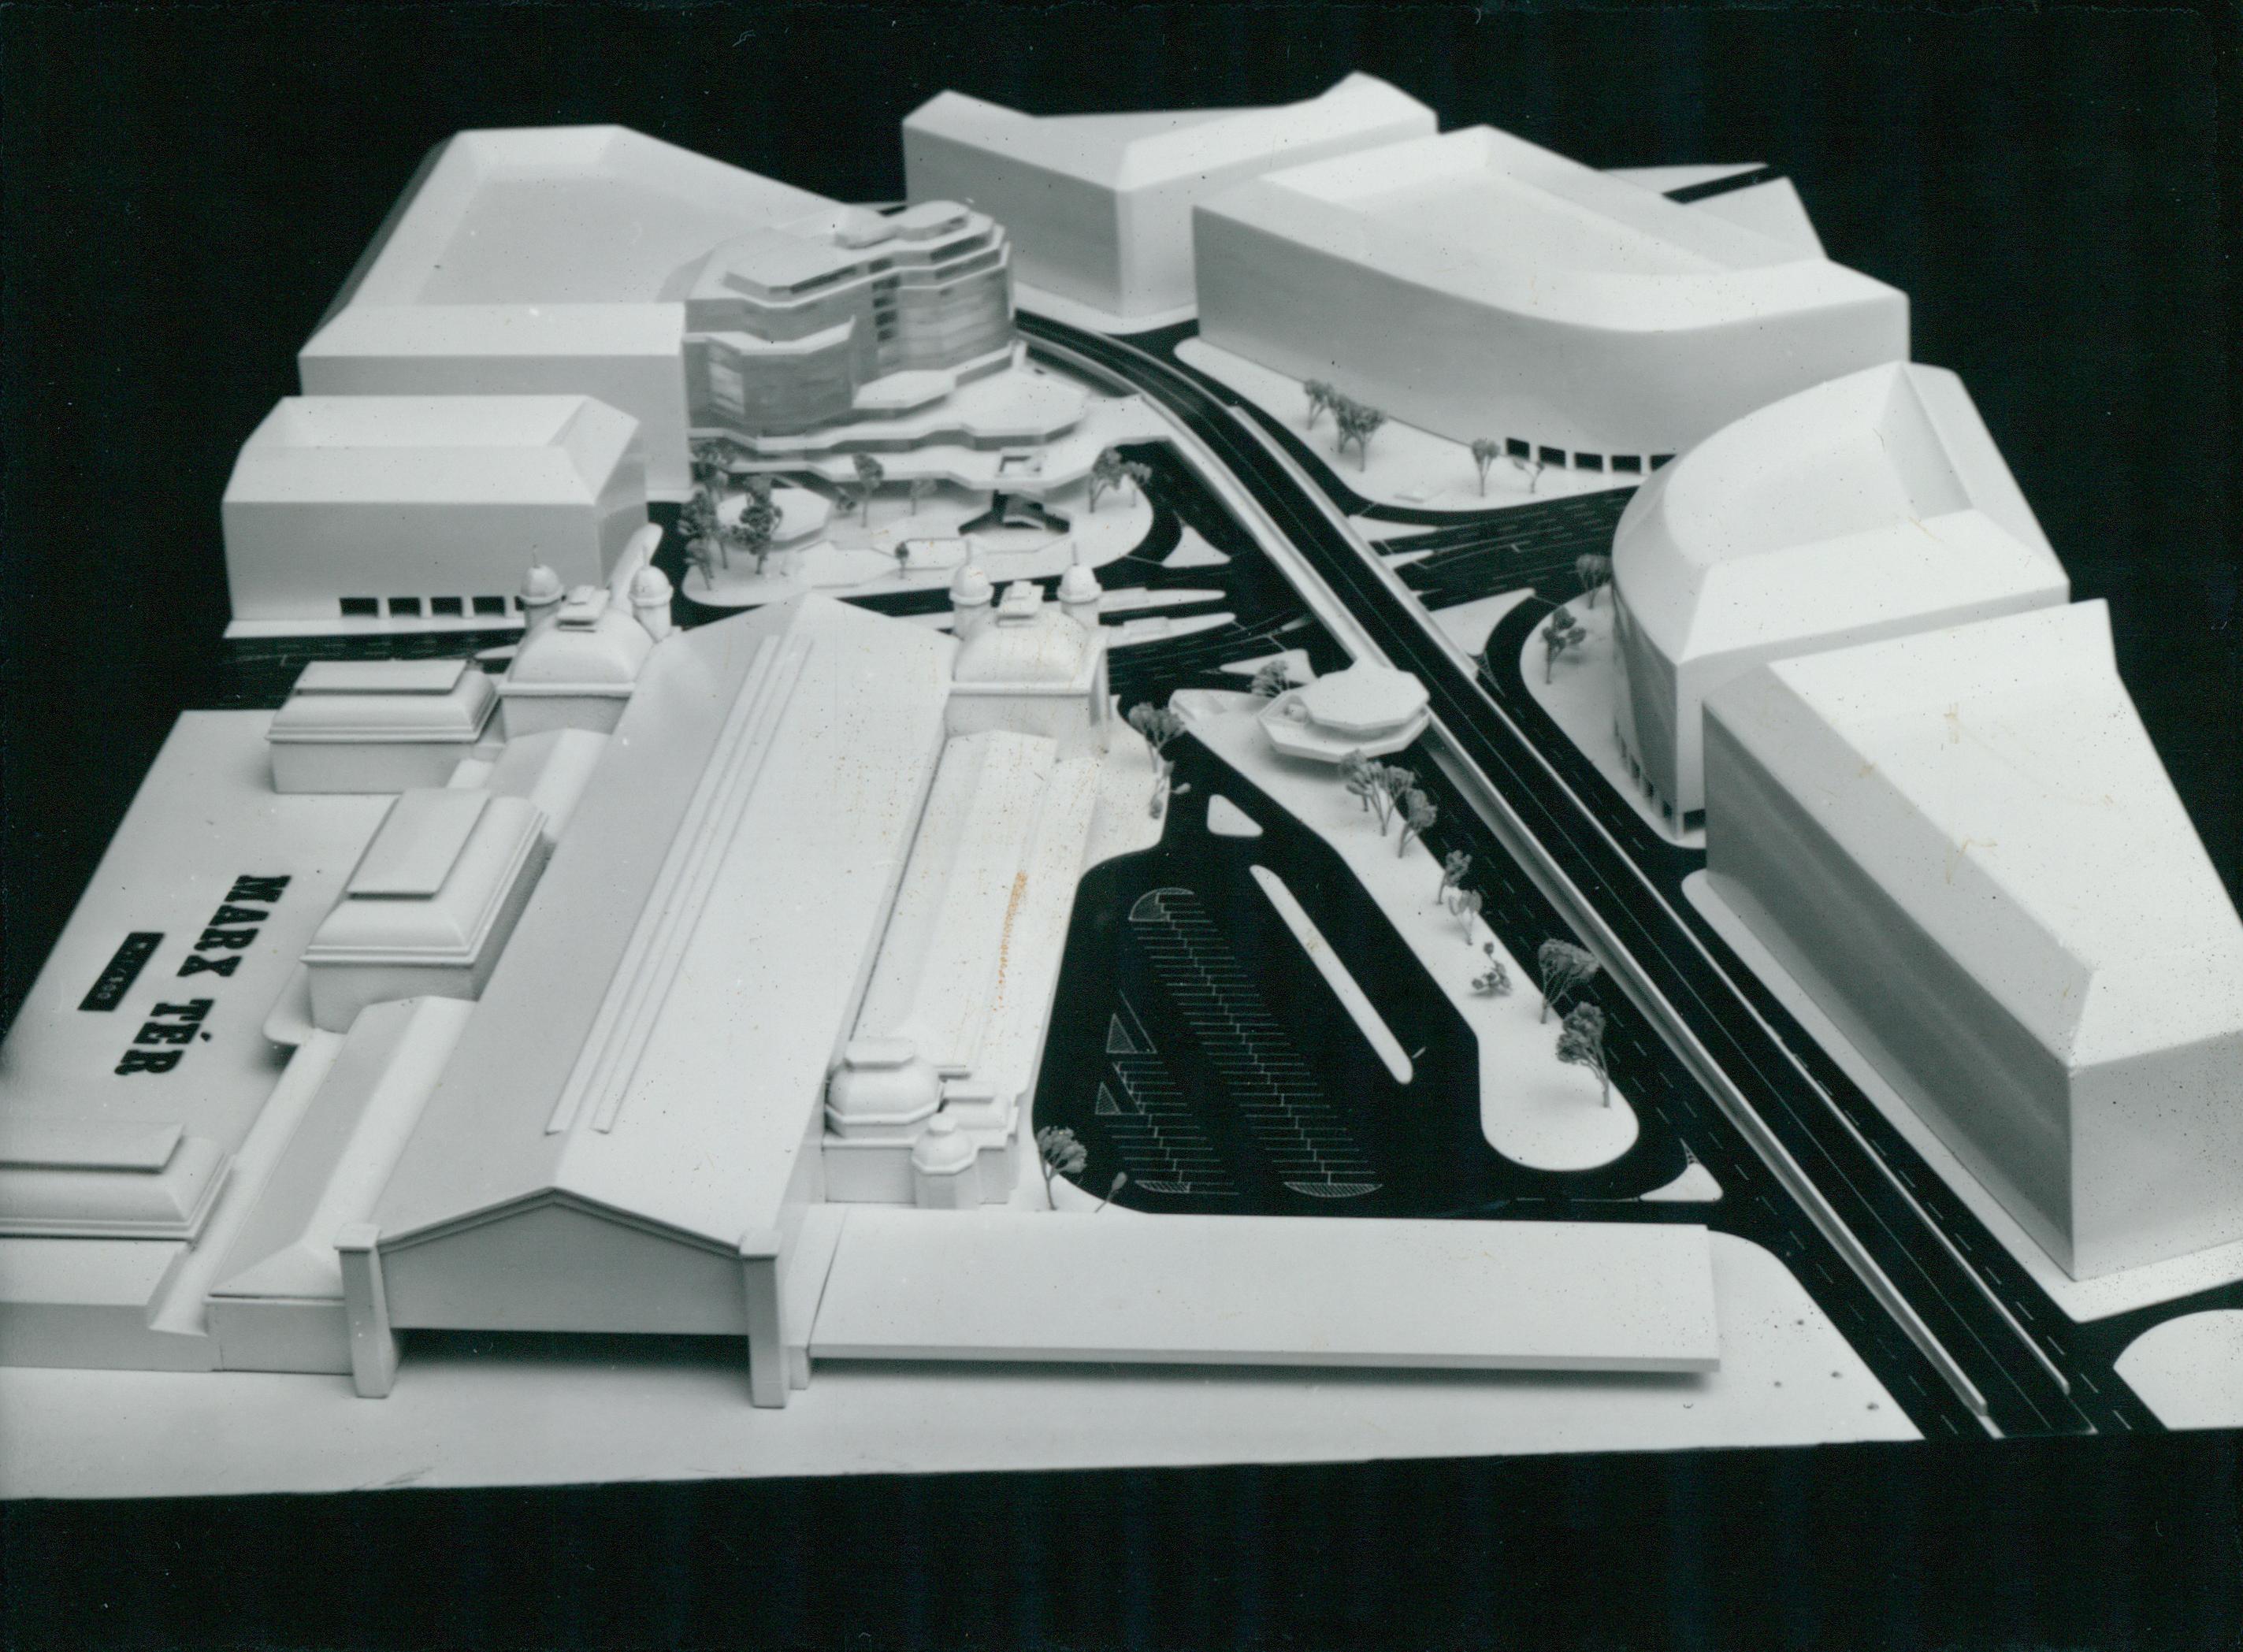 A Nyugati tér rendezési tervének modellje